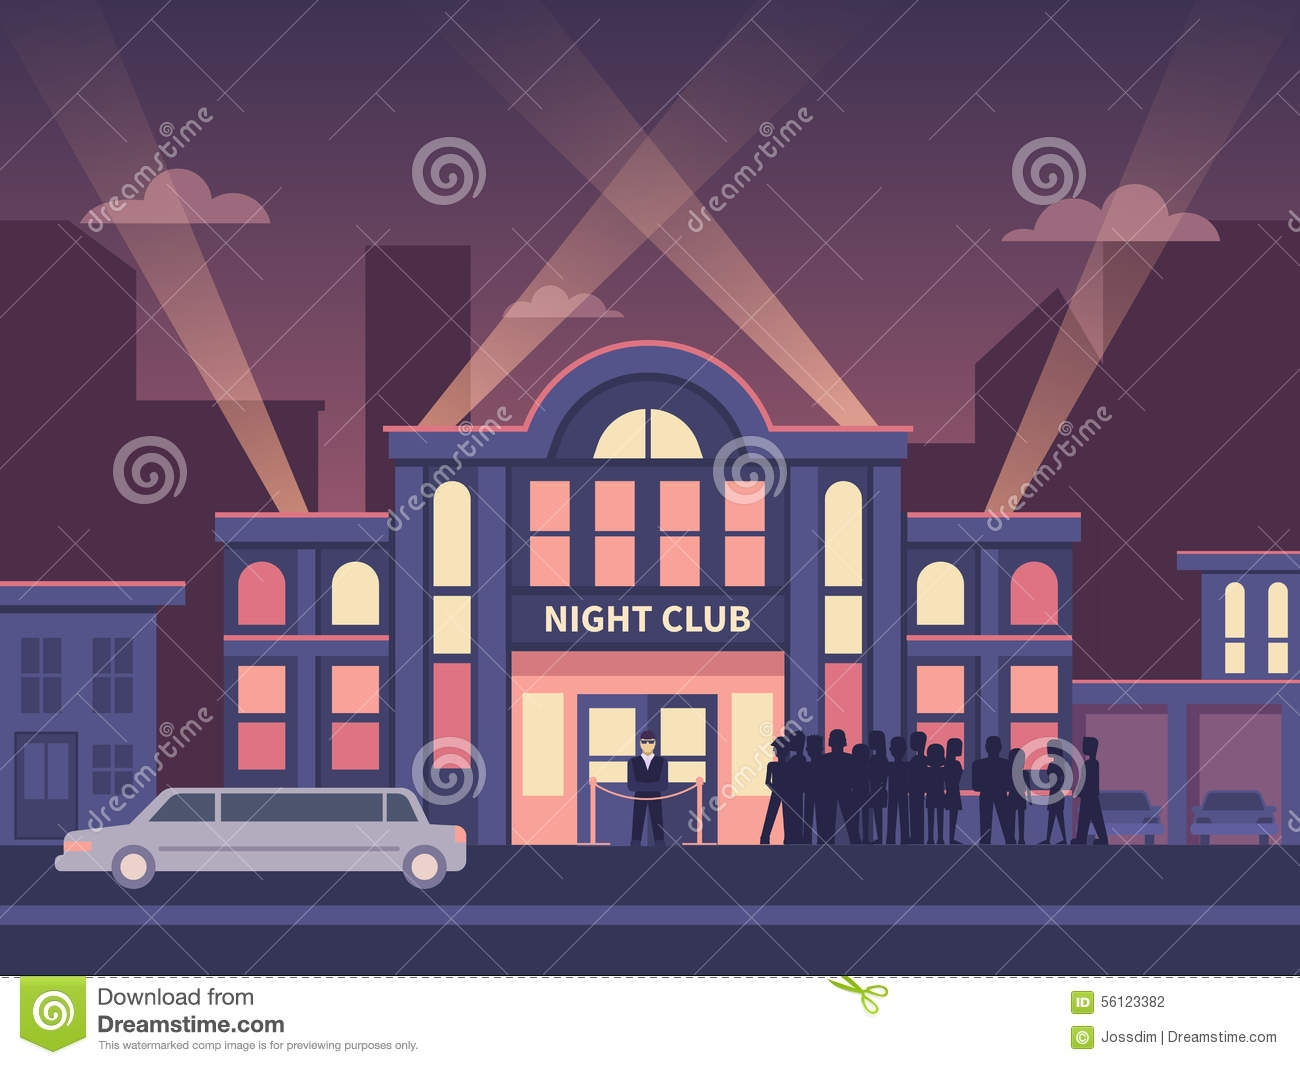 Nightclub Building Clipart.